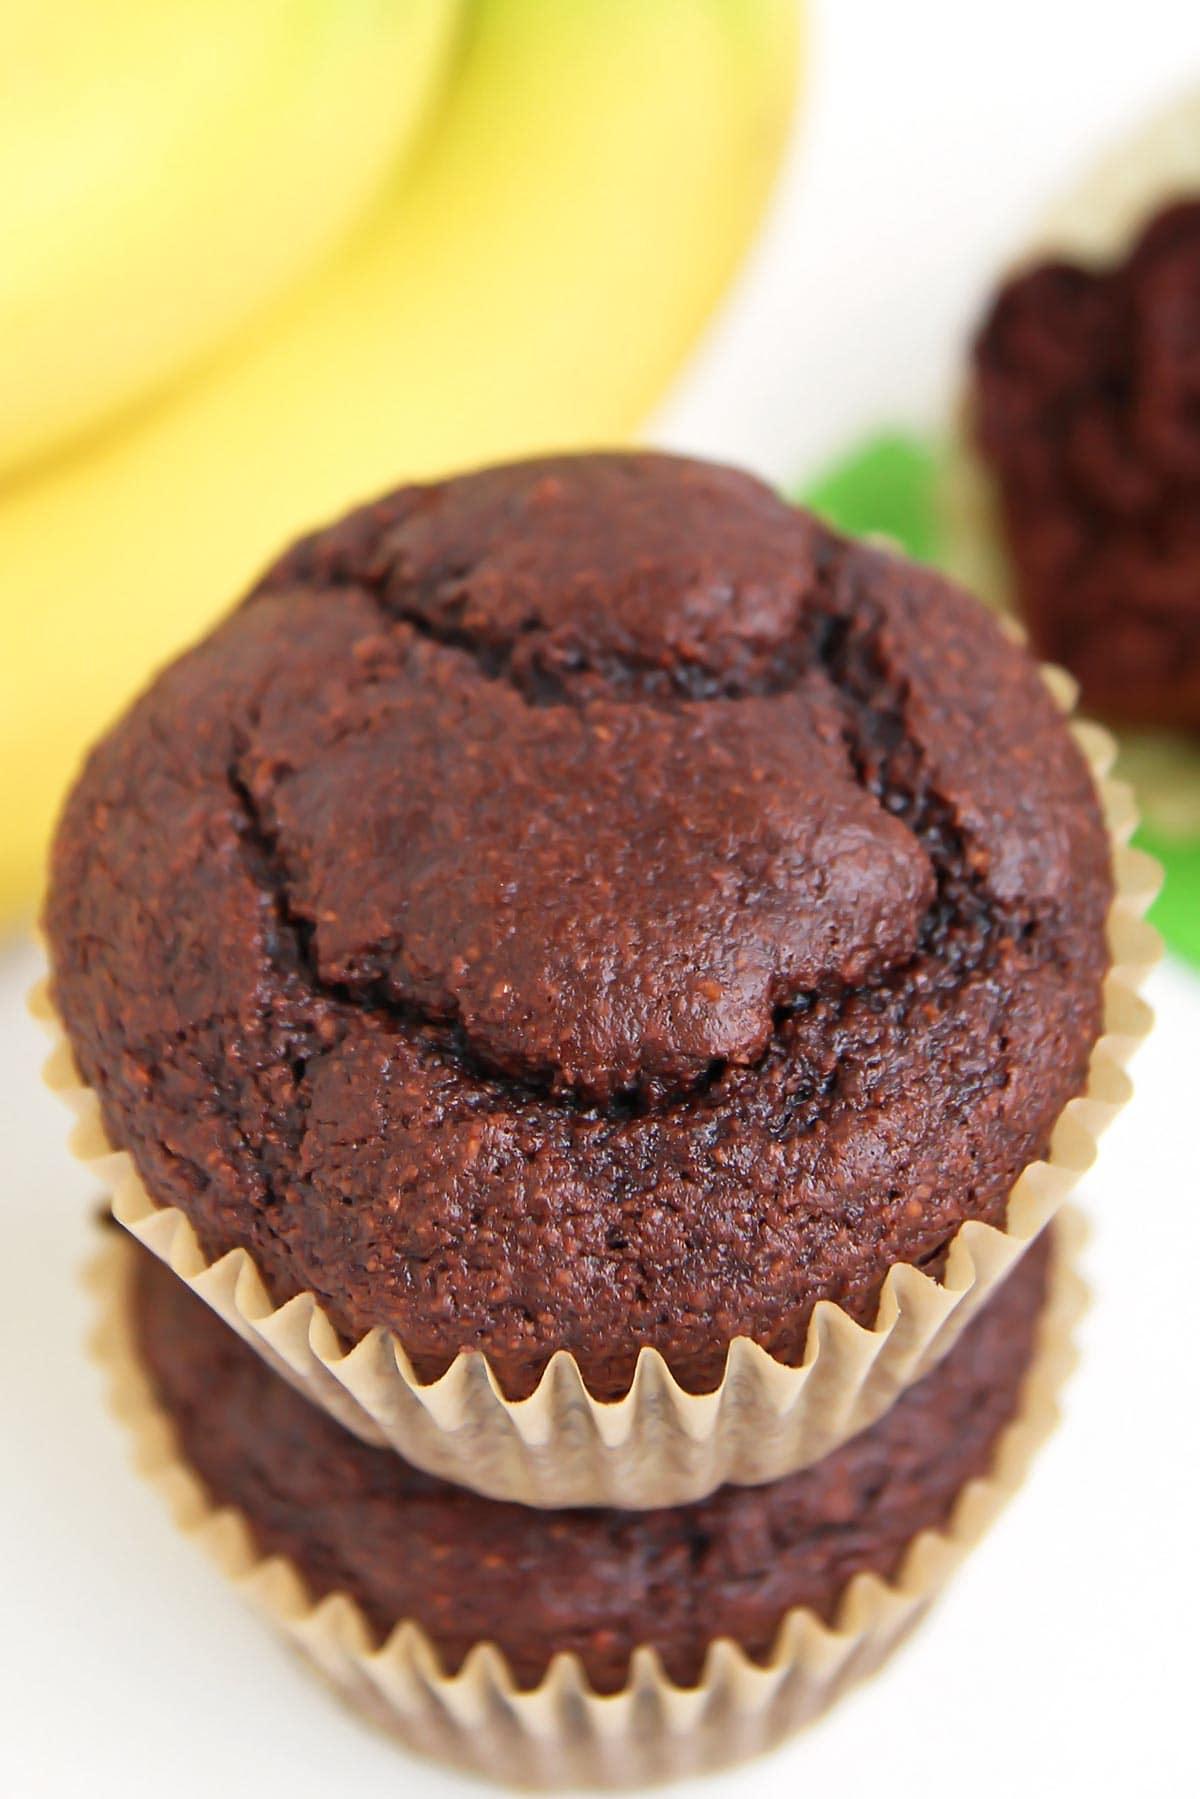 Coconut Flour Chocolate Banana Muffins